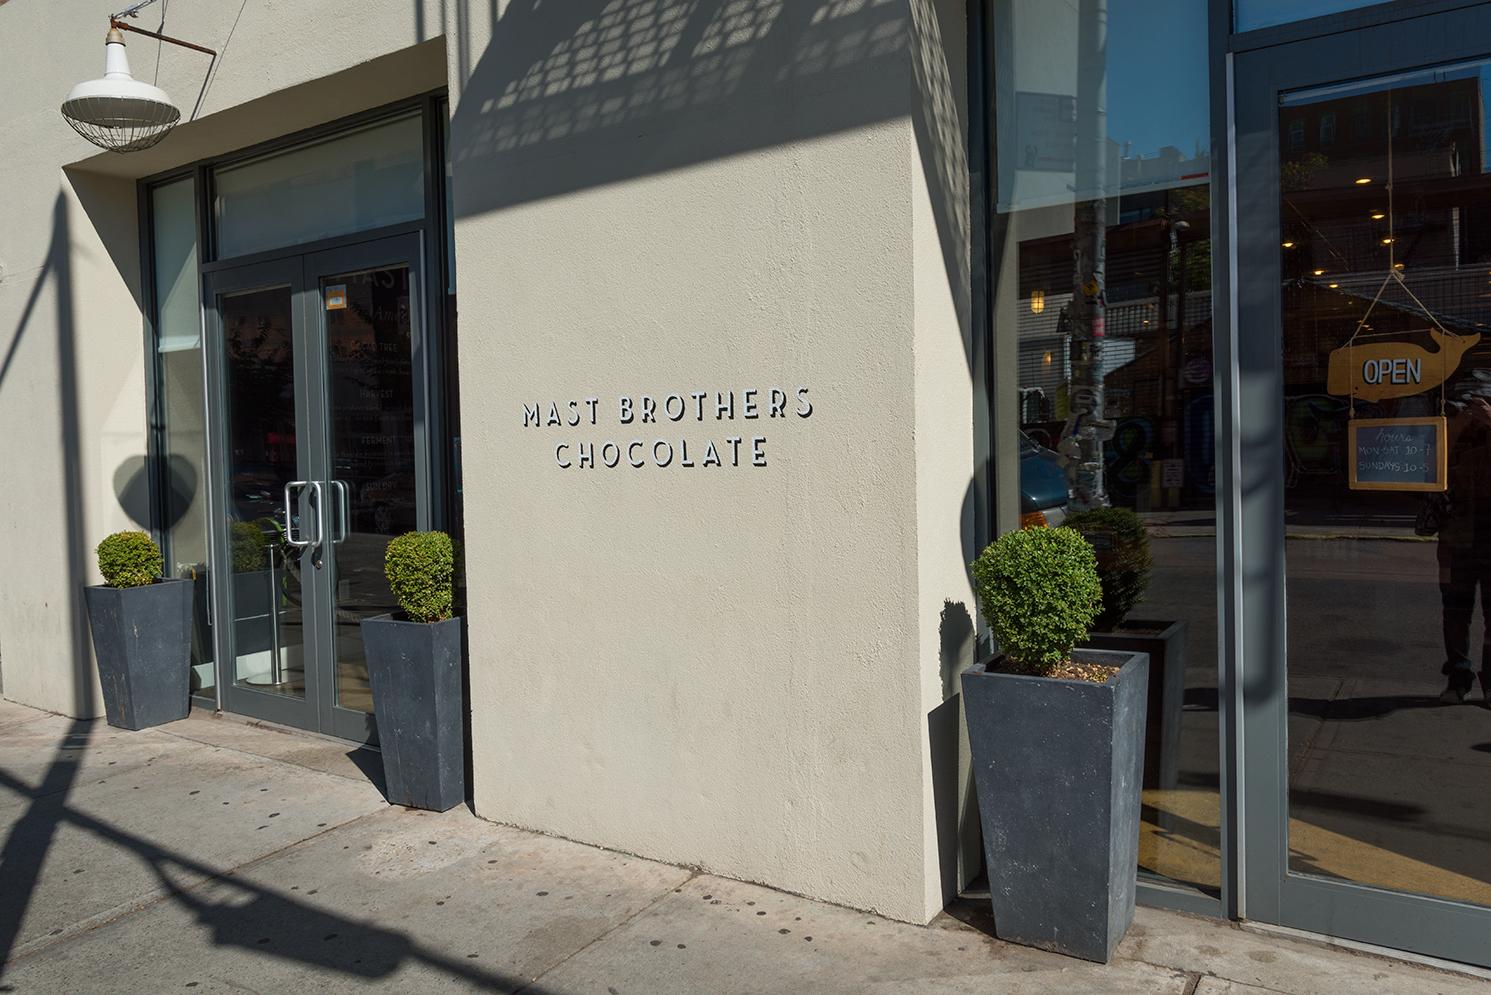 ROCK MAMA NYC LIFESTYLE BLOG - mast brothers chocolate